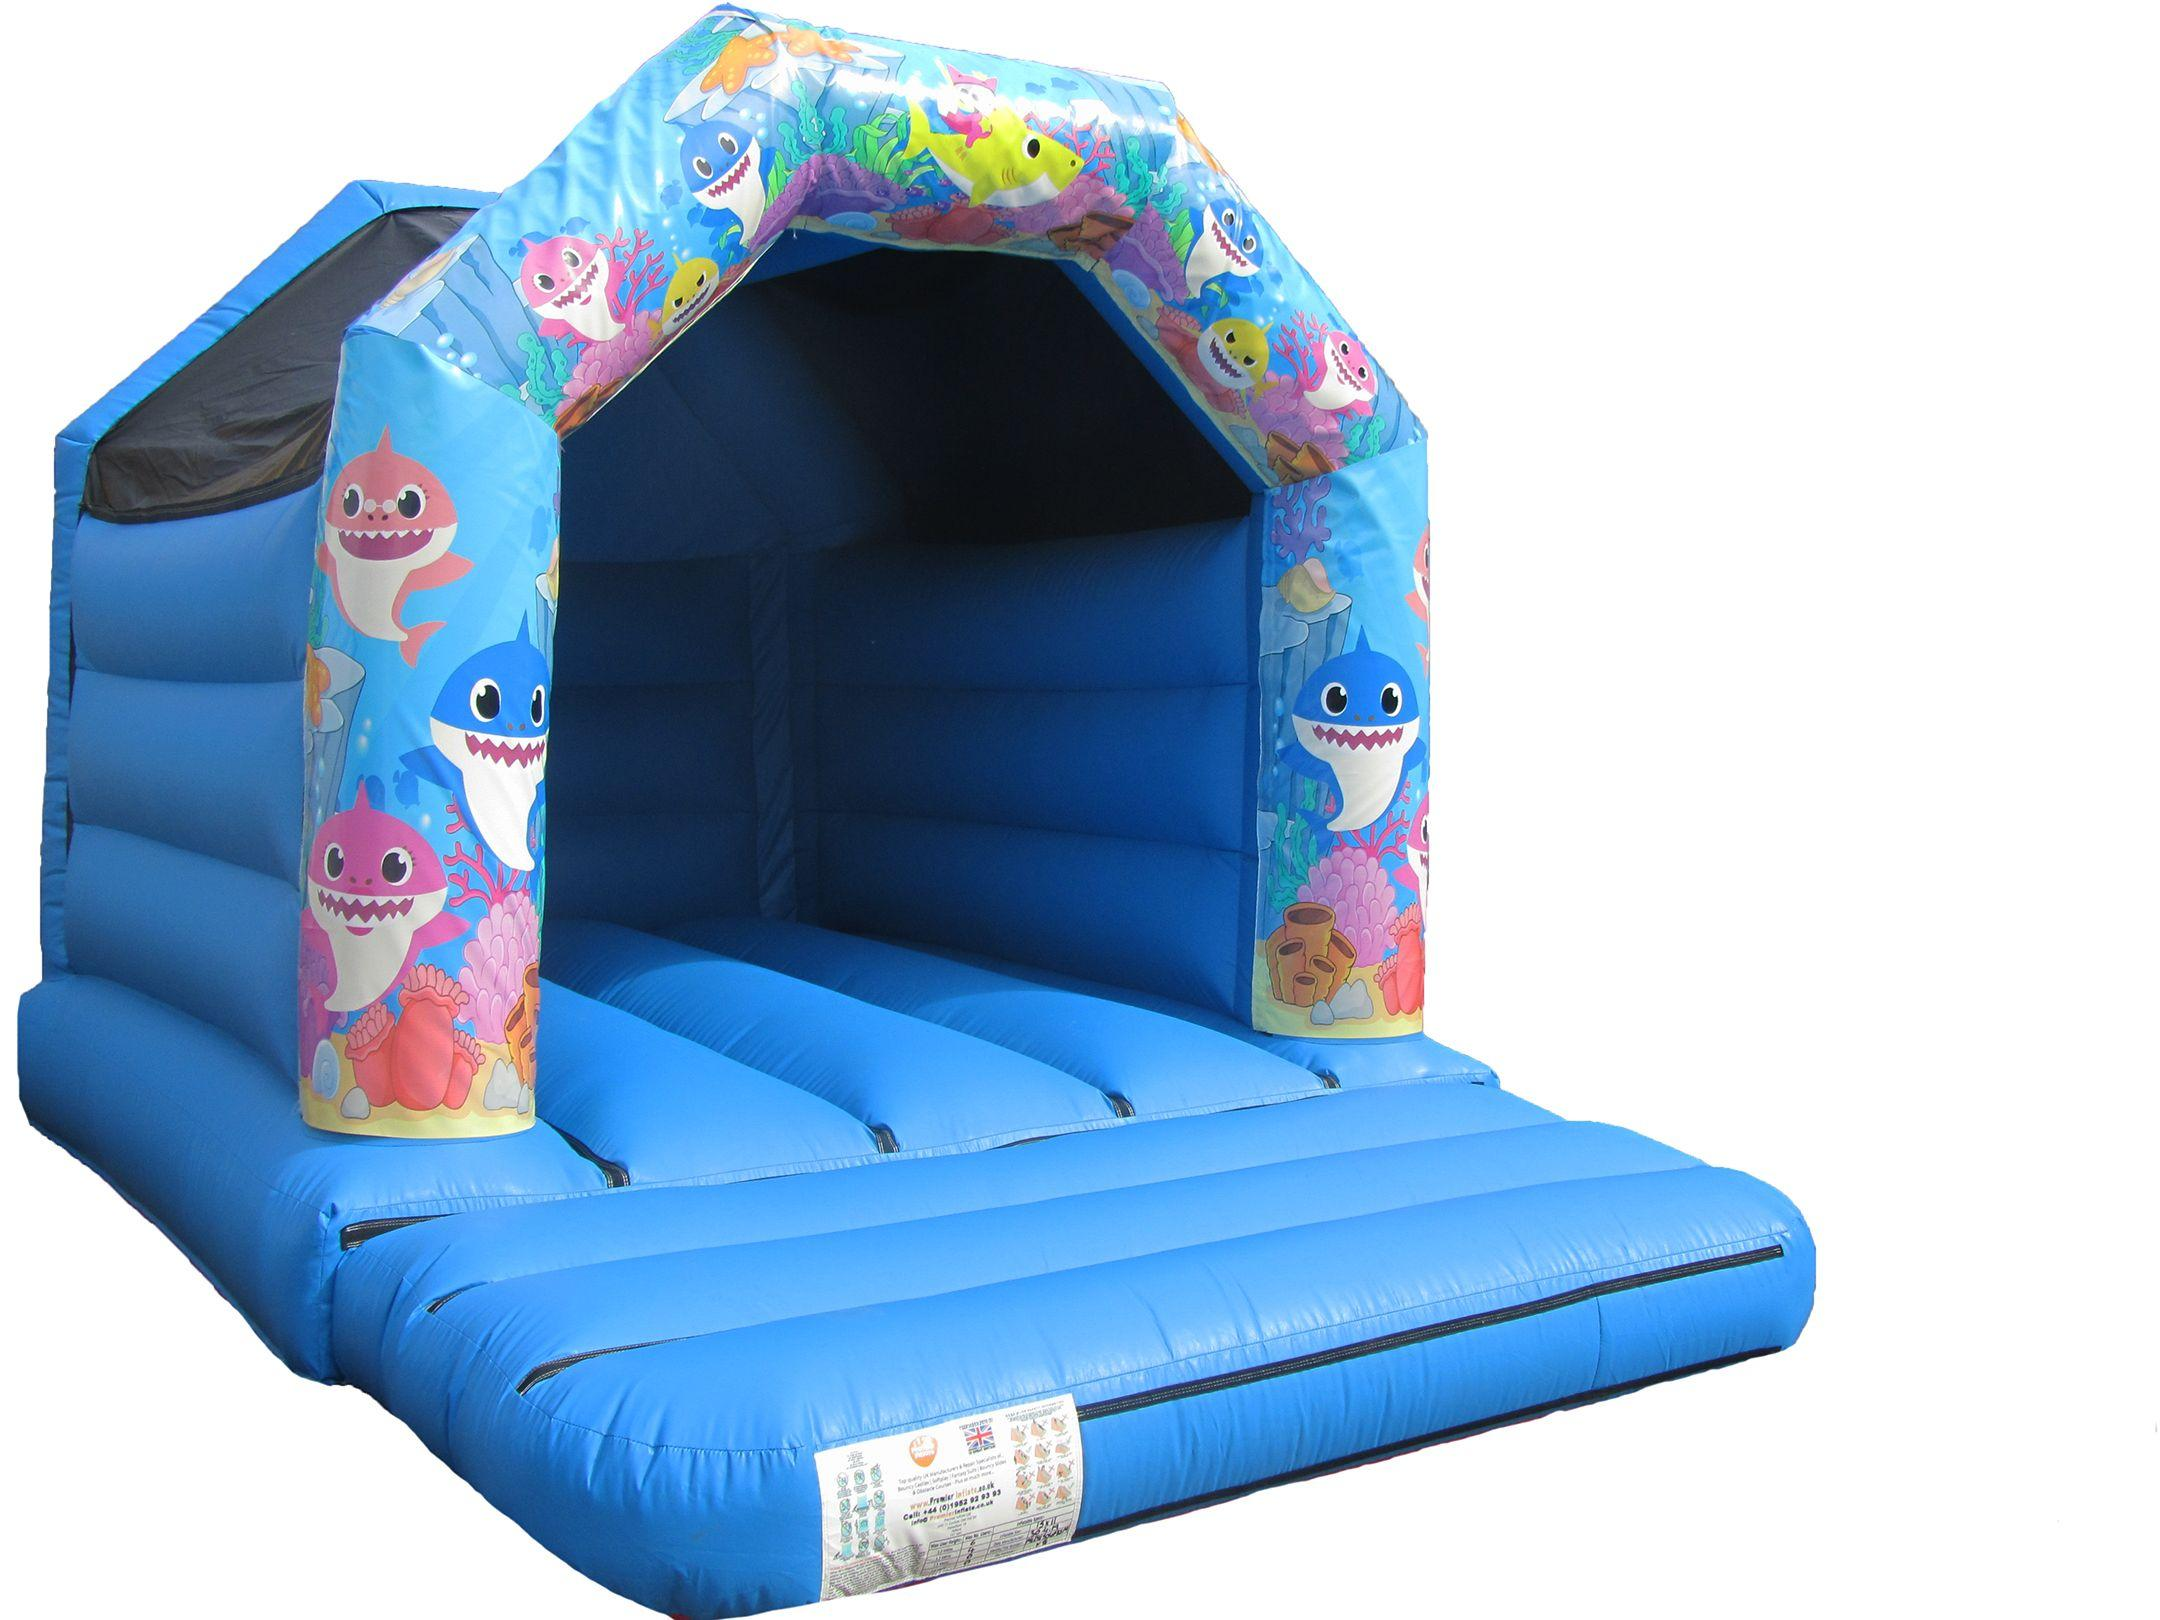 Commercial Children's Bouncy Castle for Sale